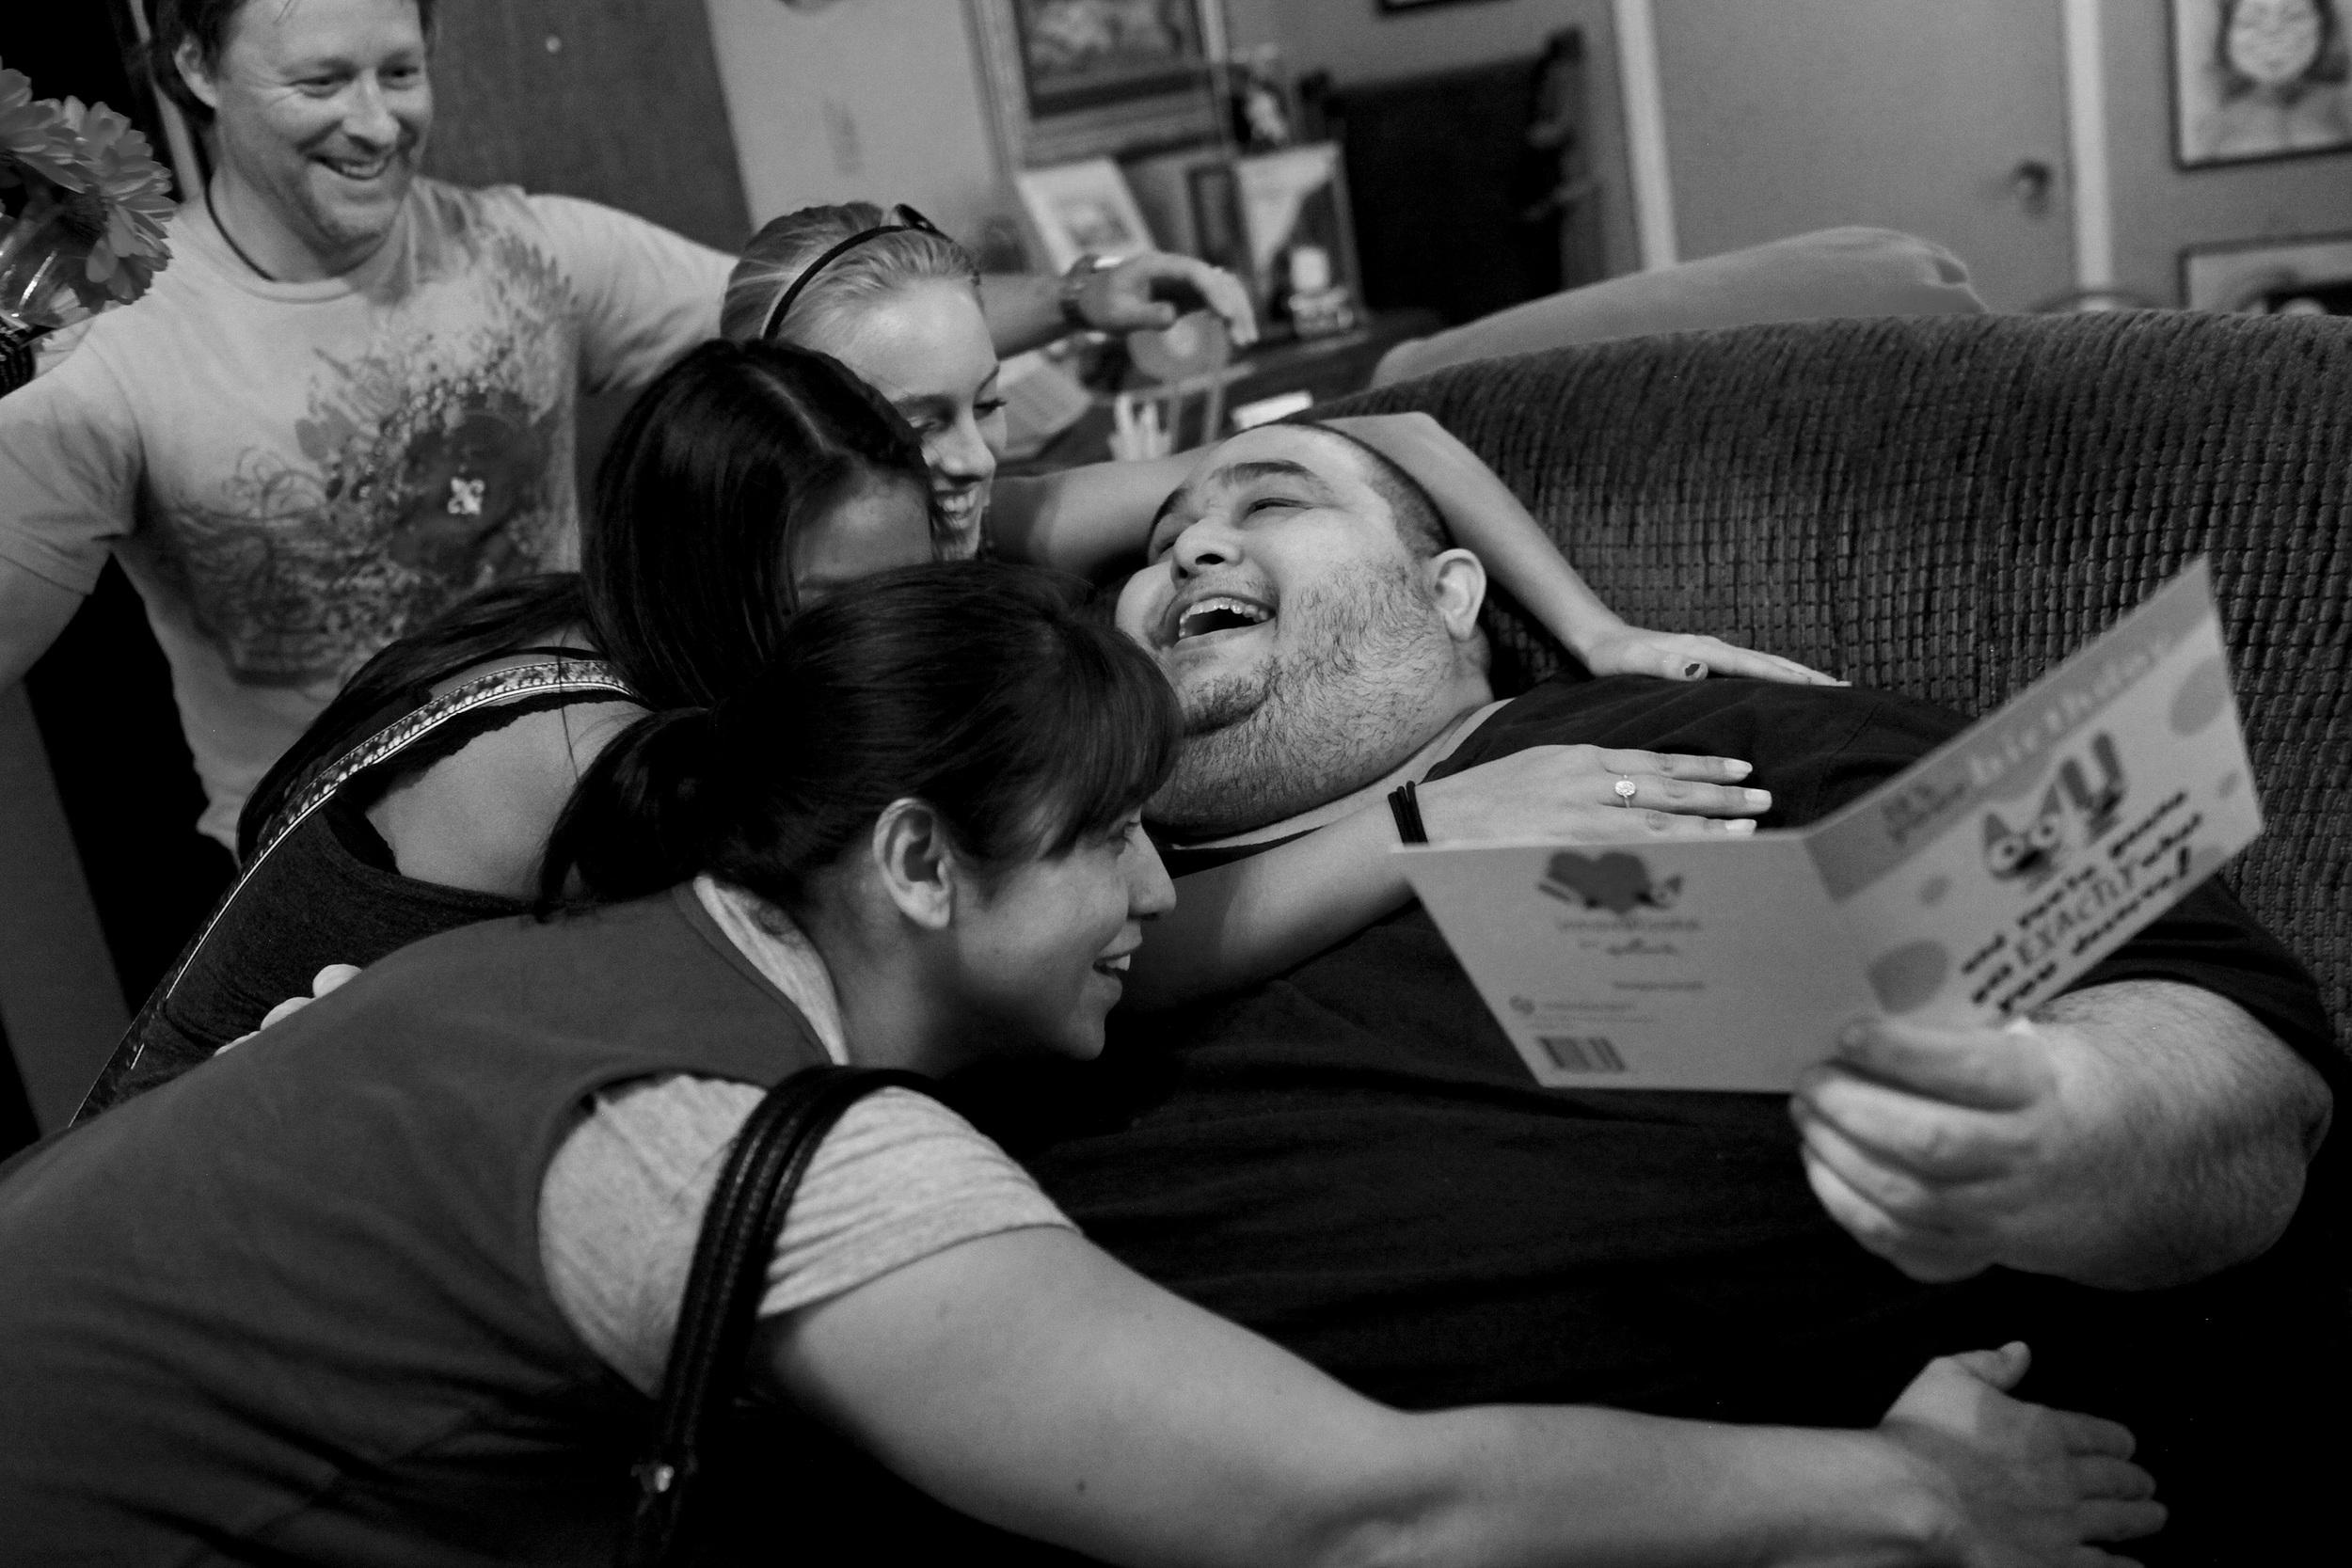 Hector Garciagets a visit from his family to celebrate his 45th birthday.  © Lisa Krantz/San Antonio Express-News/ZUMA Press